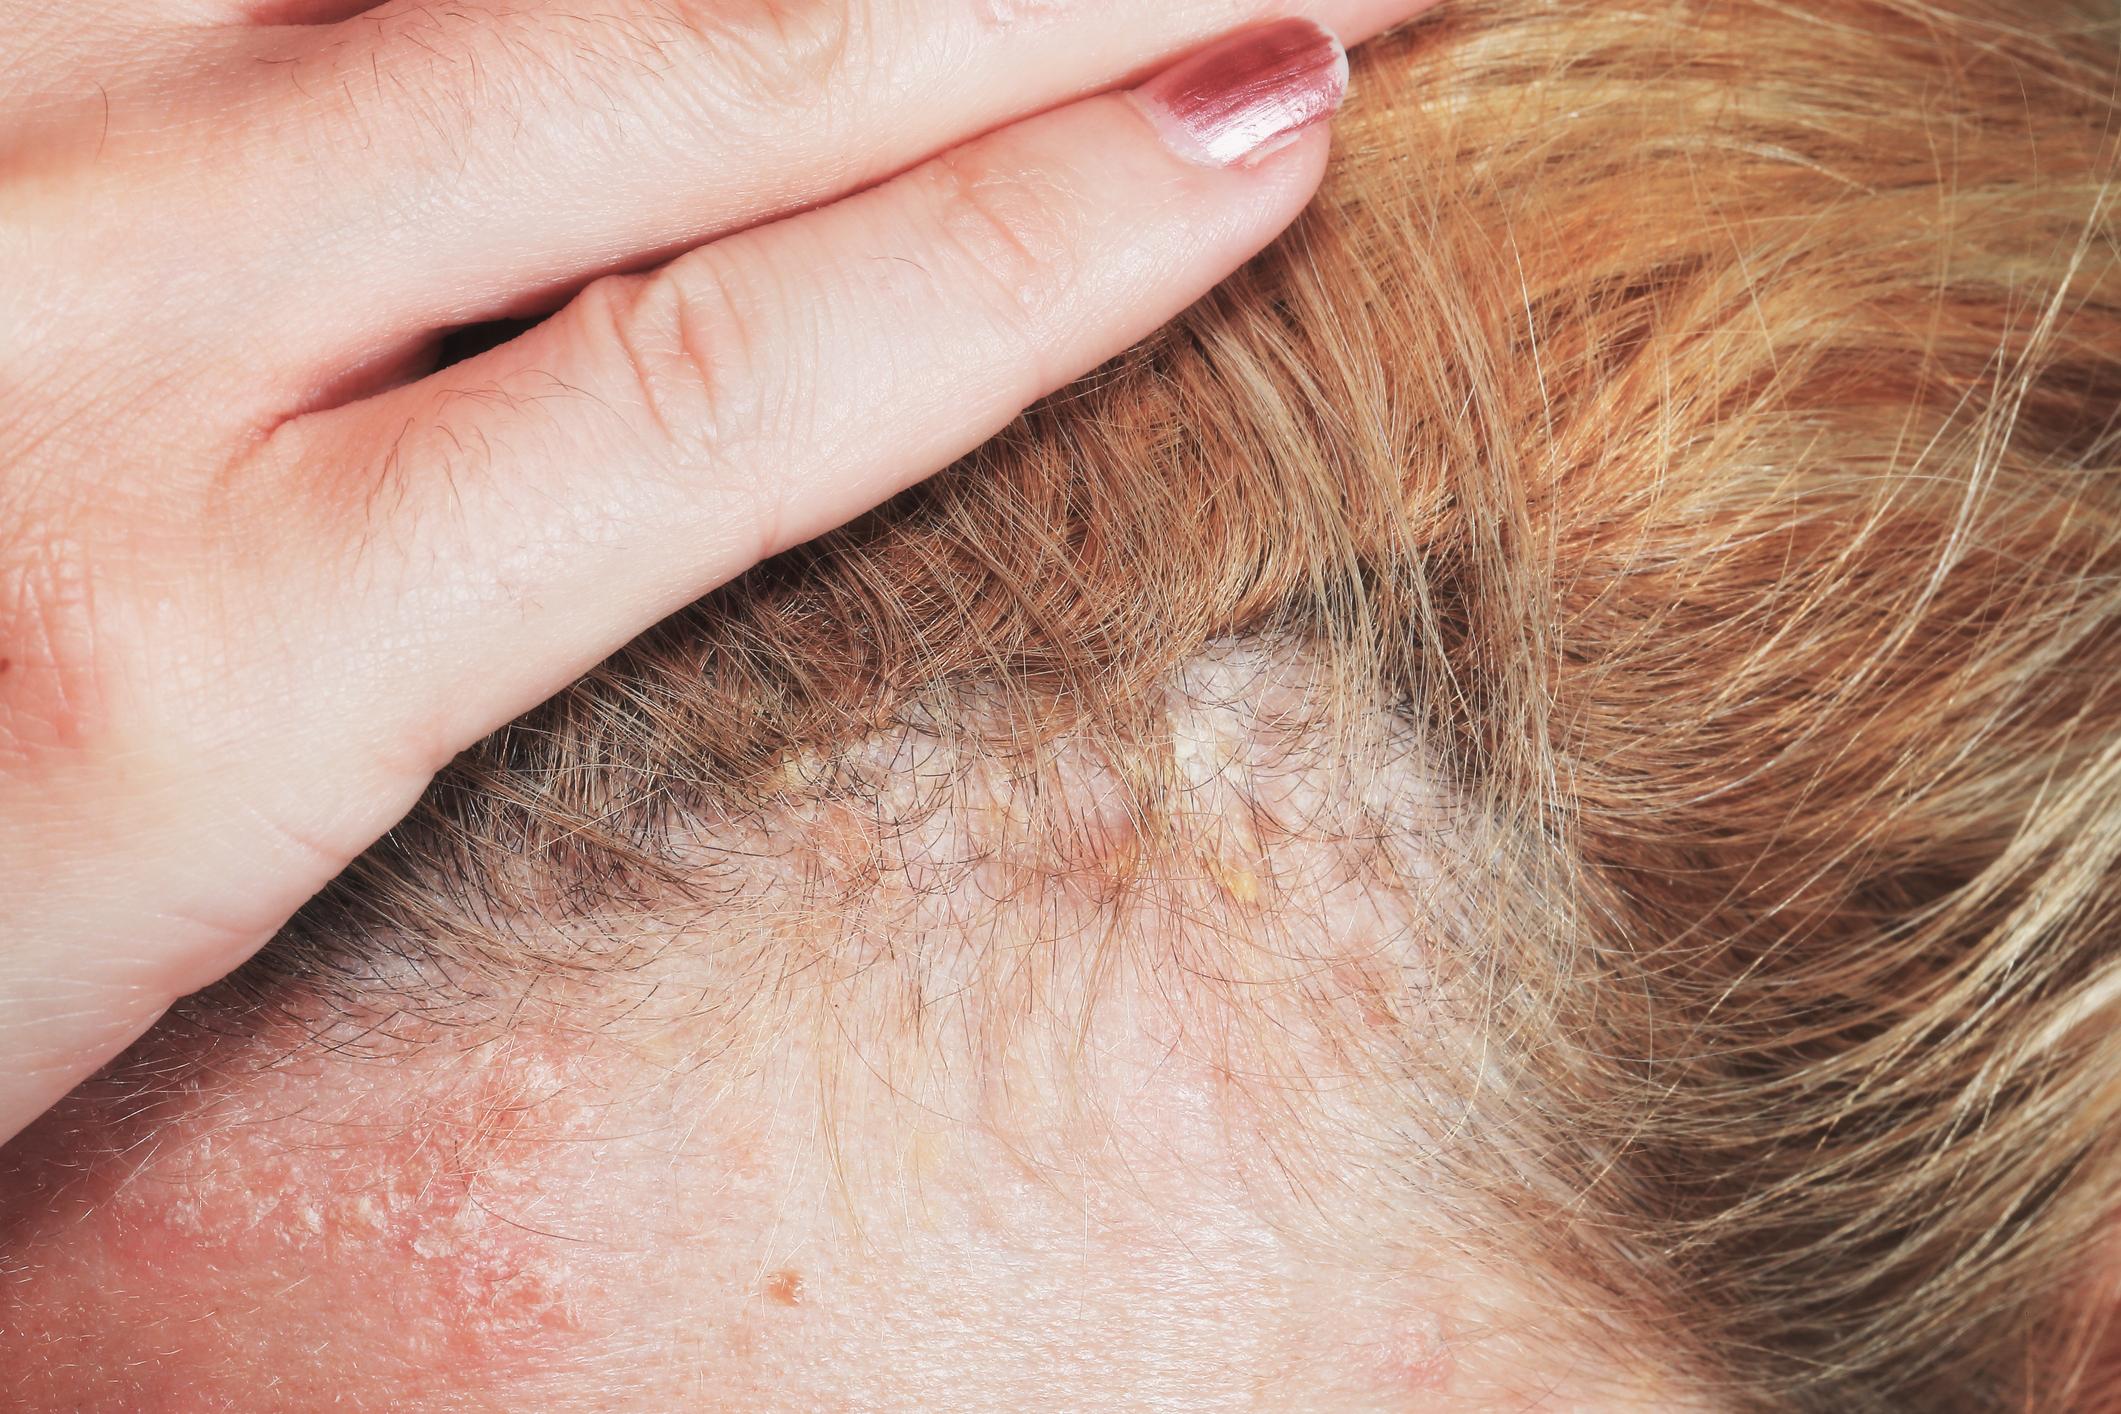 scalp psoriasis flakes